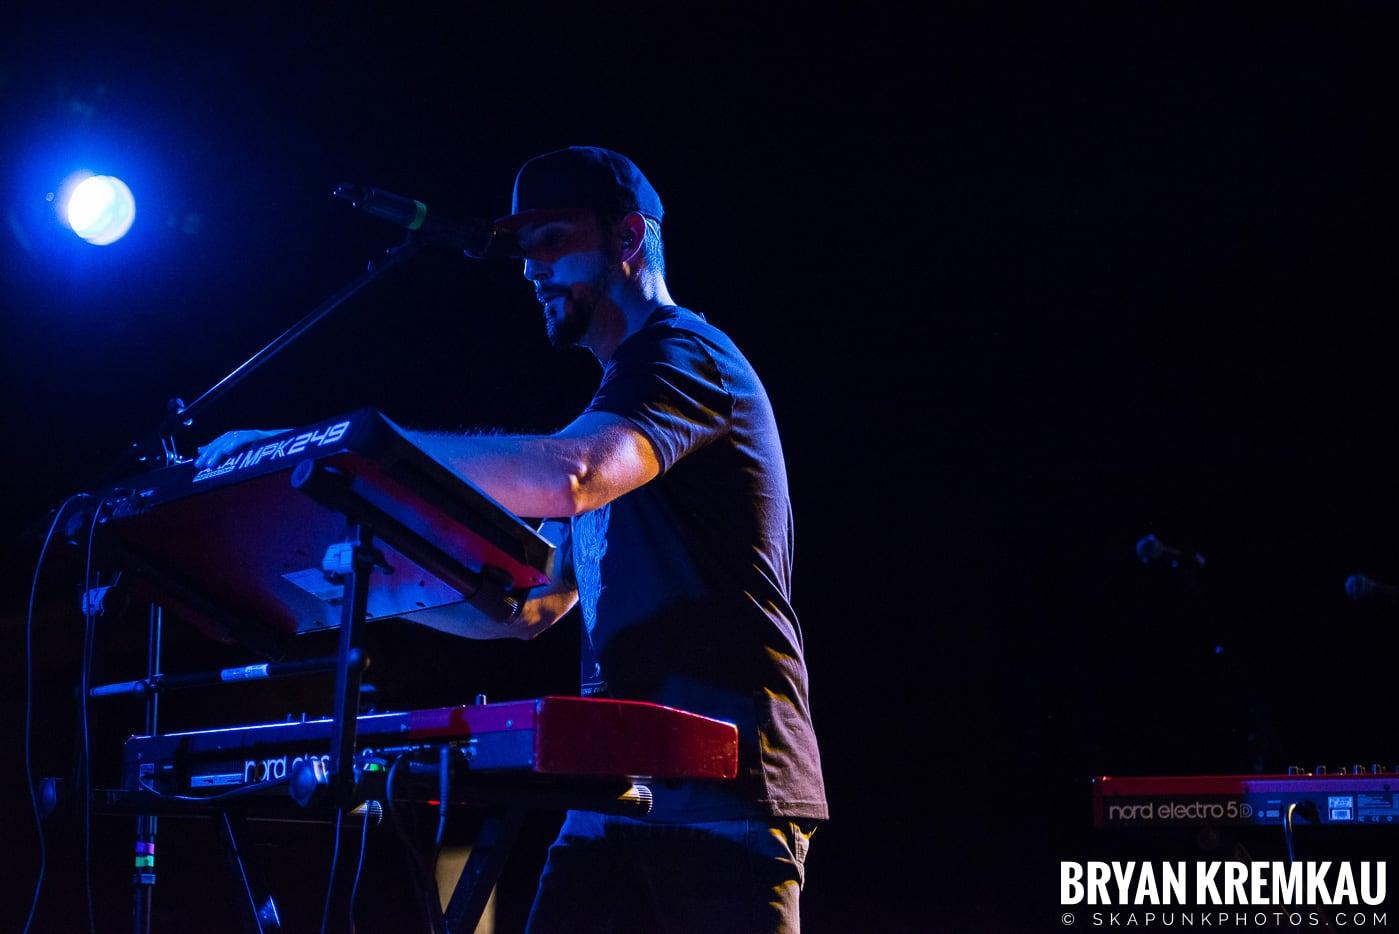 Ballyhoo! @ Starland Ballroom, Sayreville, NJ - 11.23.18 (11)